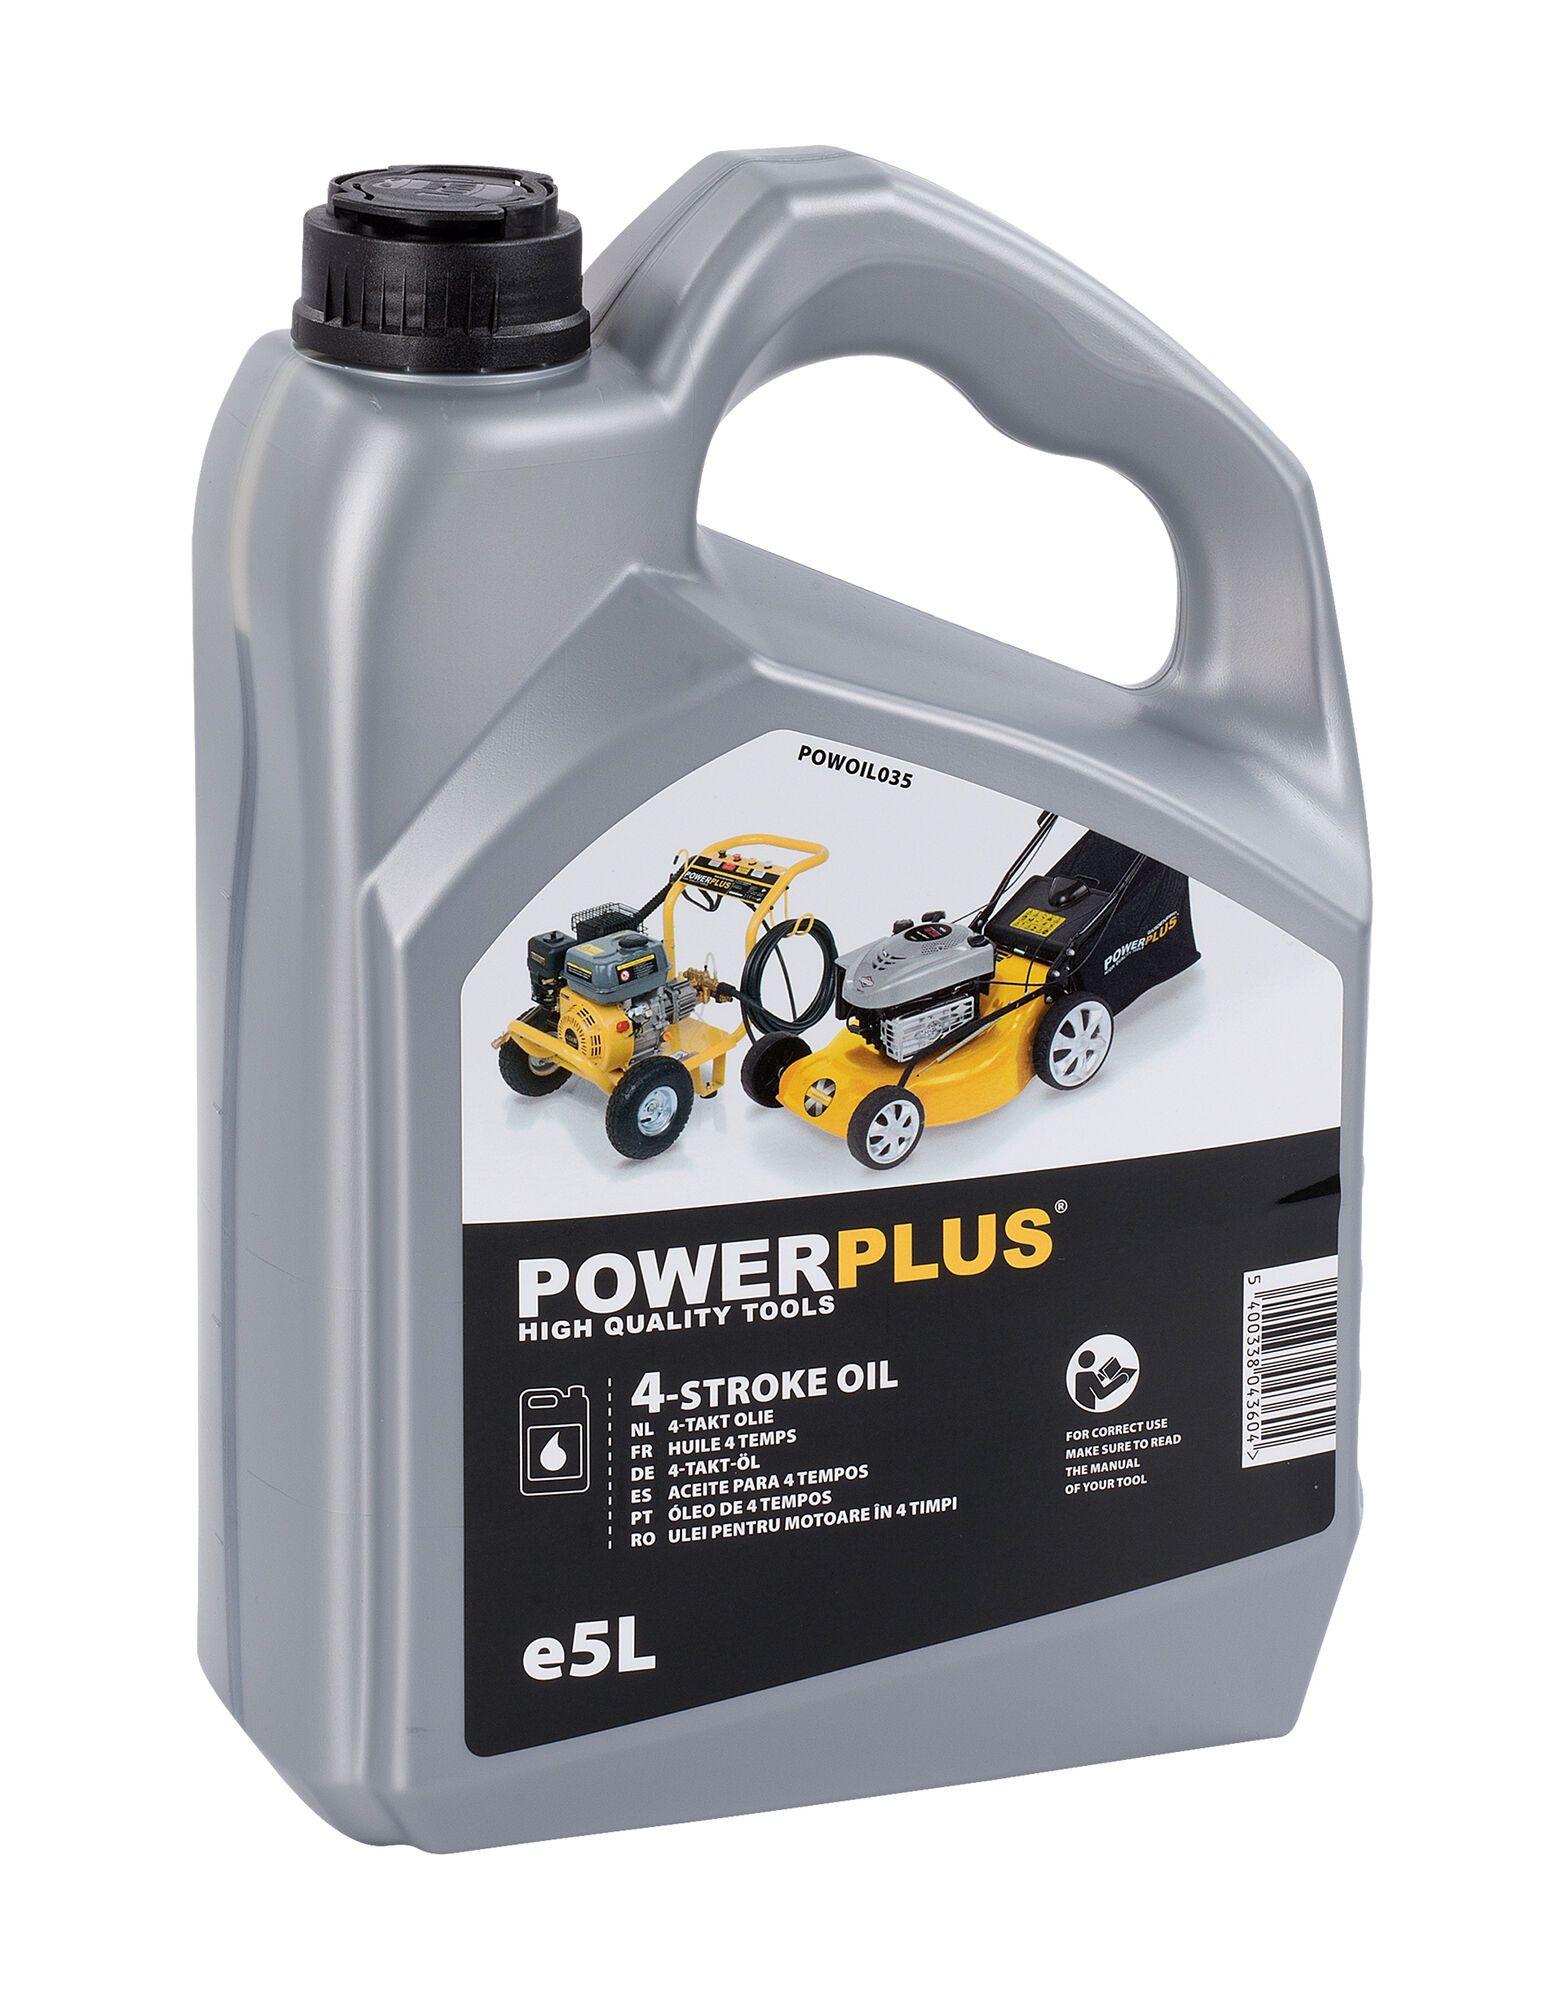 Powerplus POWOIL035 4-takt olie | 5 liter olie voor 4-takt machines